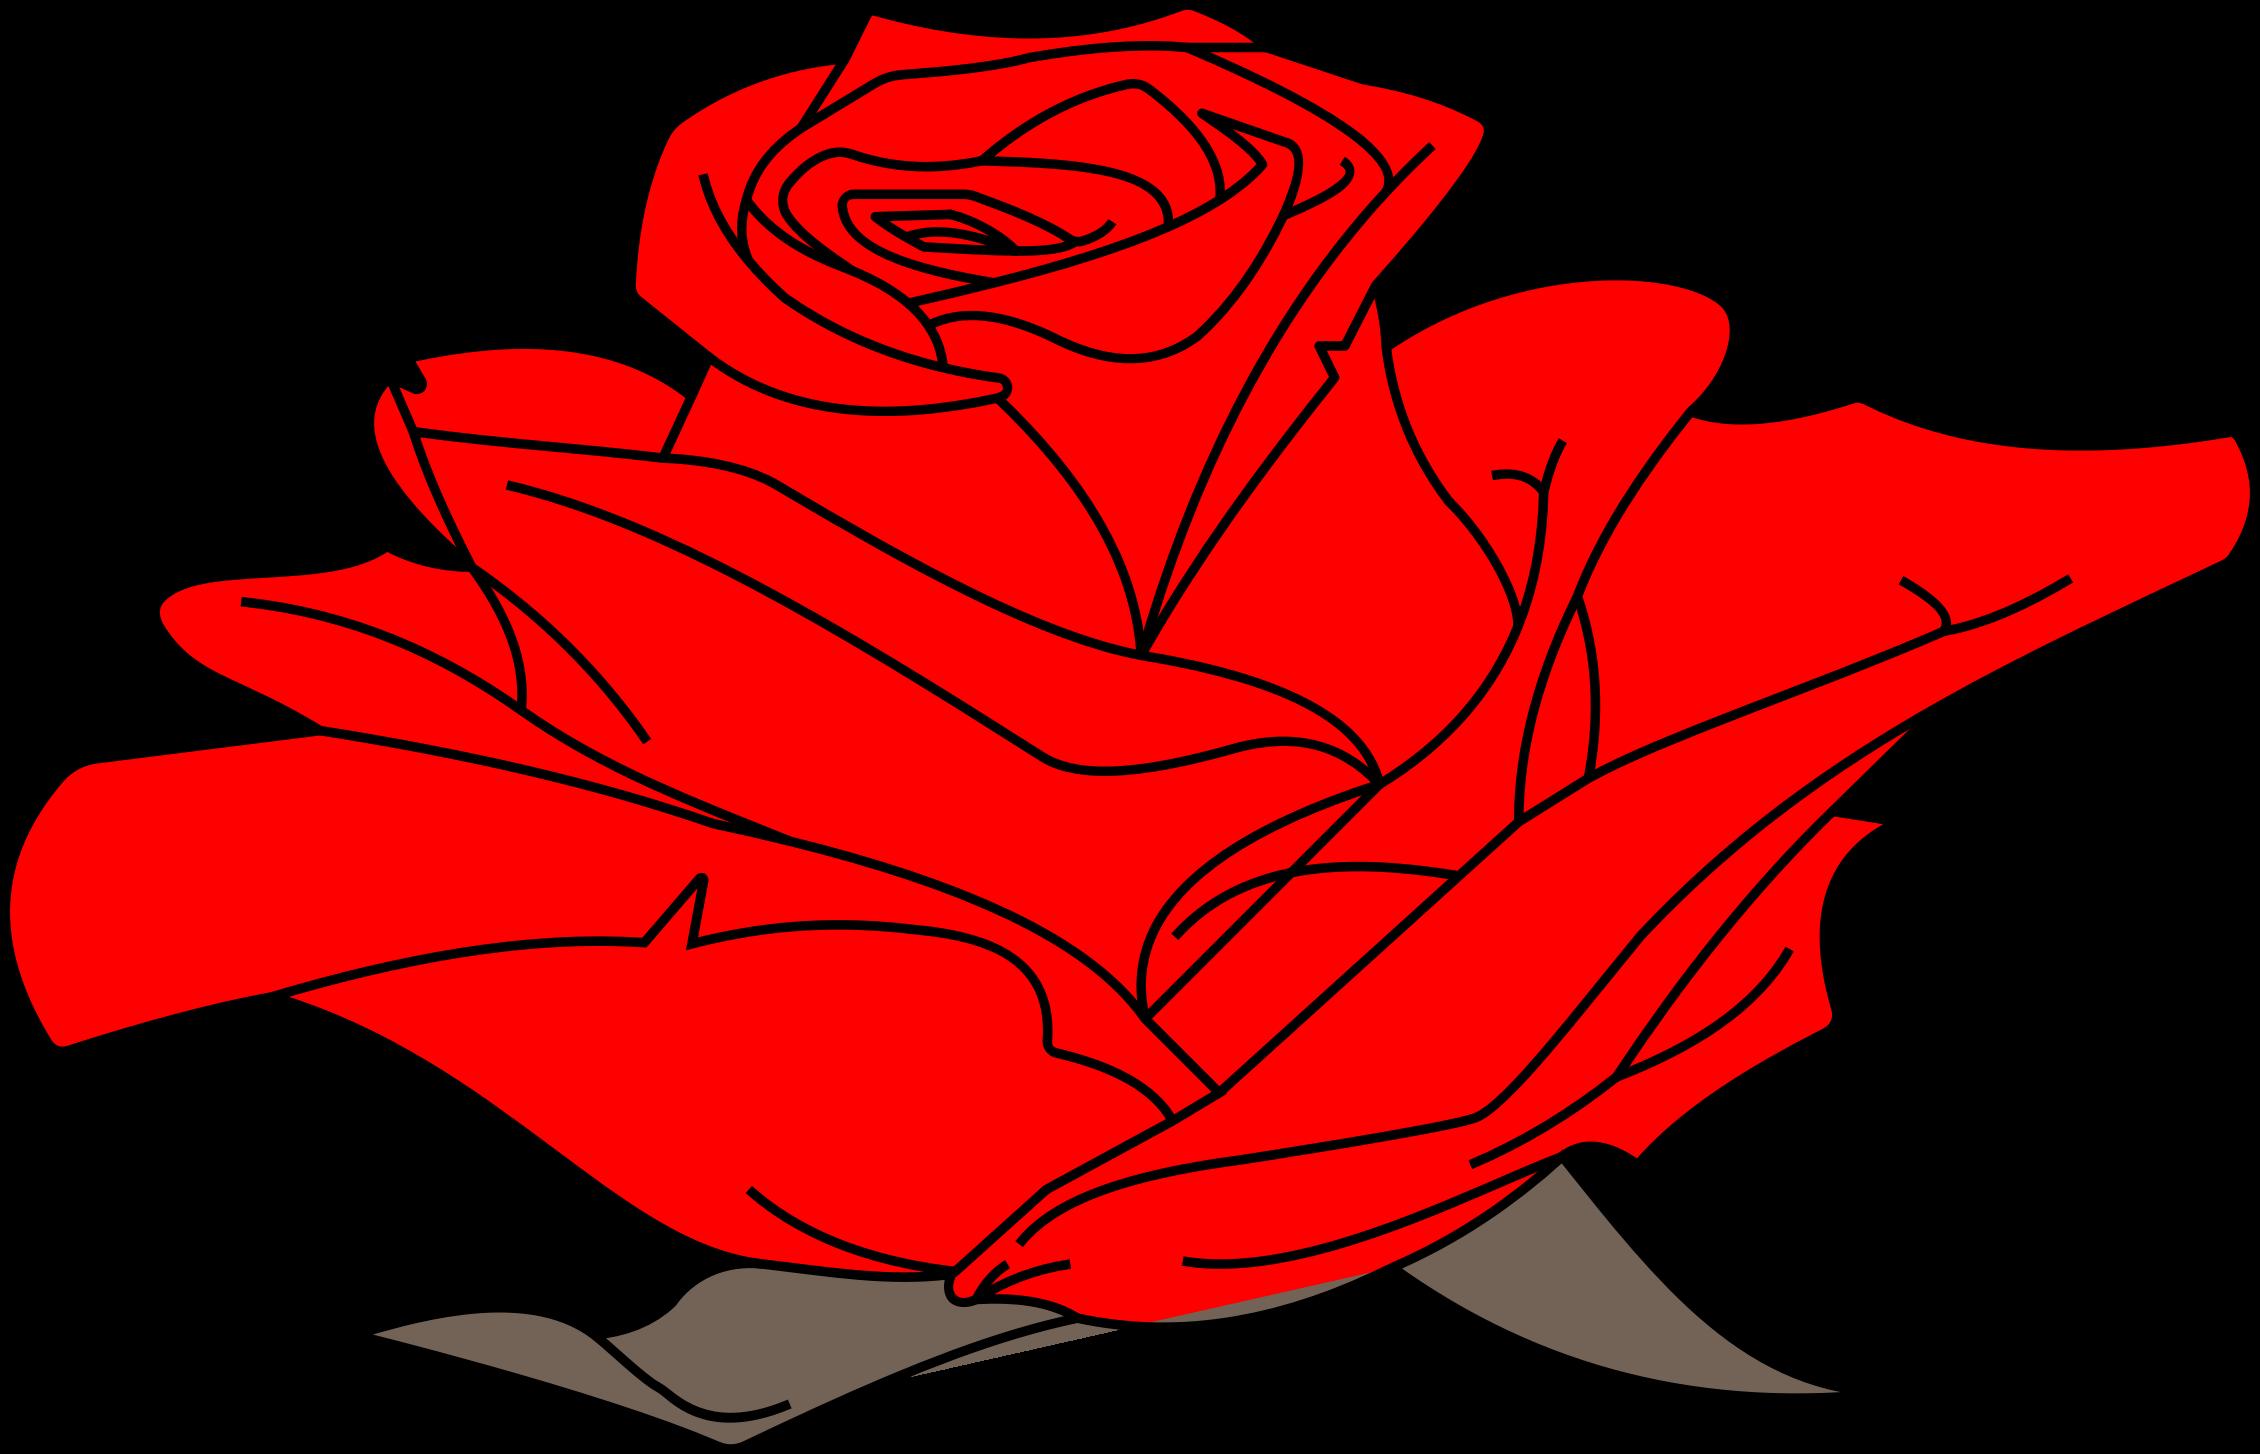 Line Art Rose : Rose line art clipart best